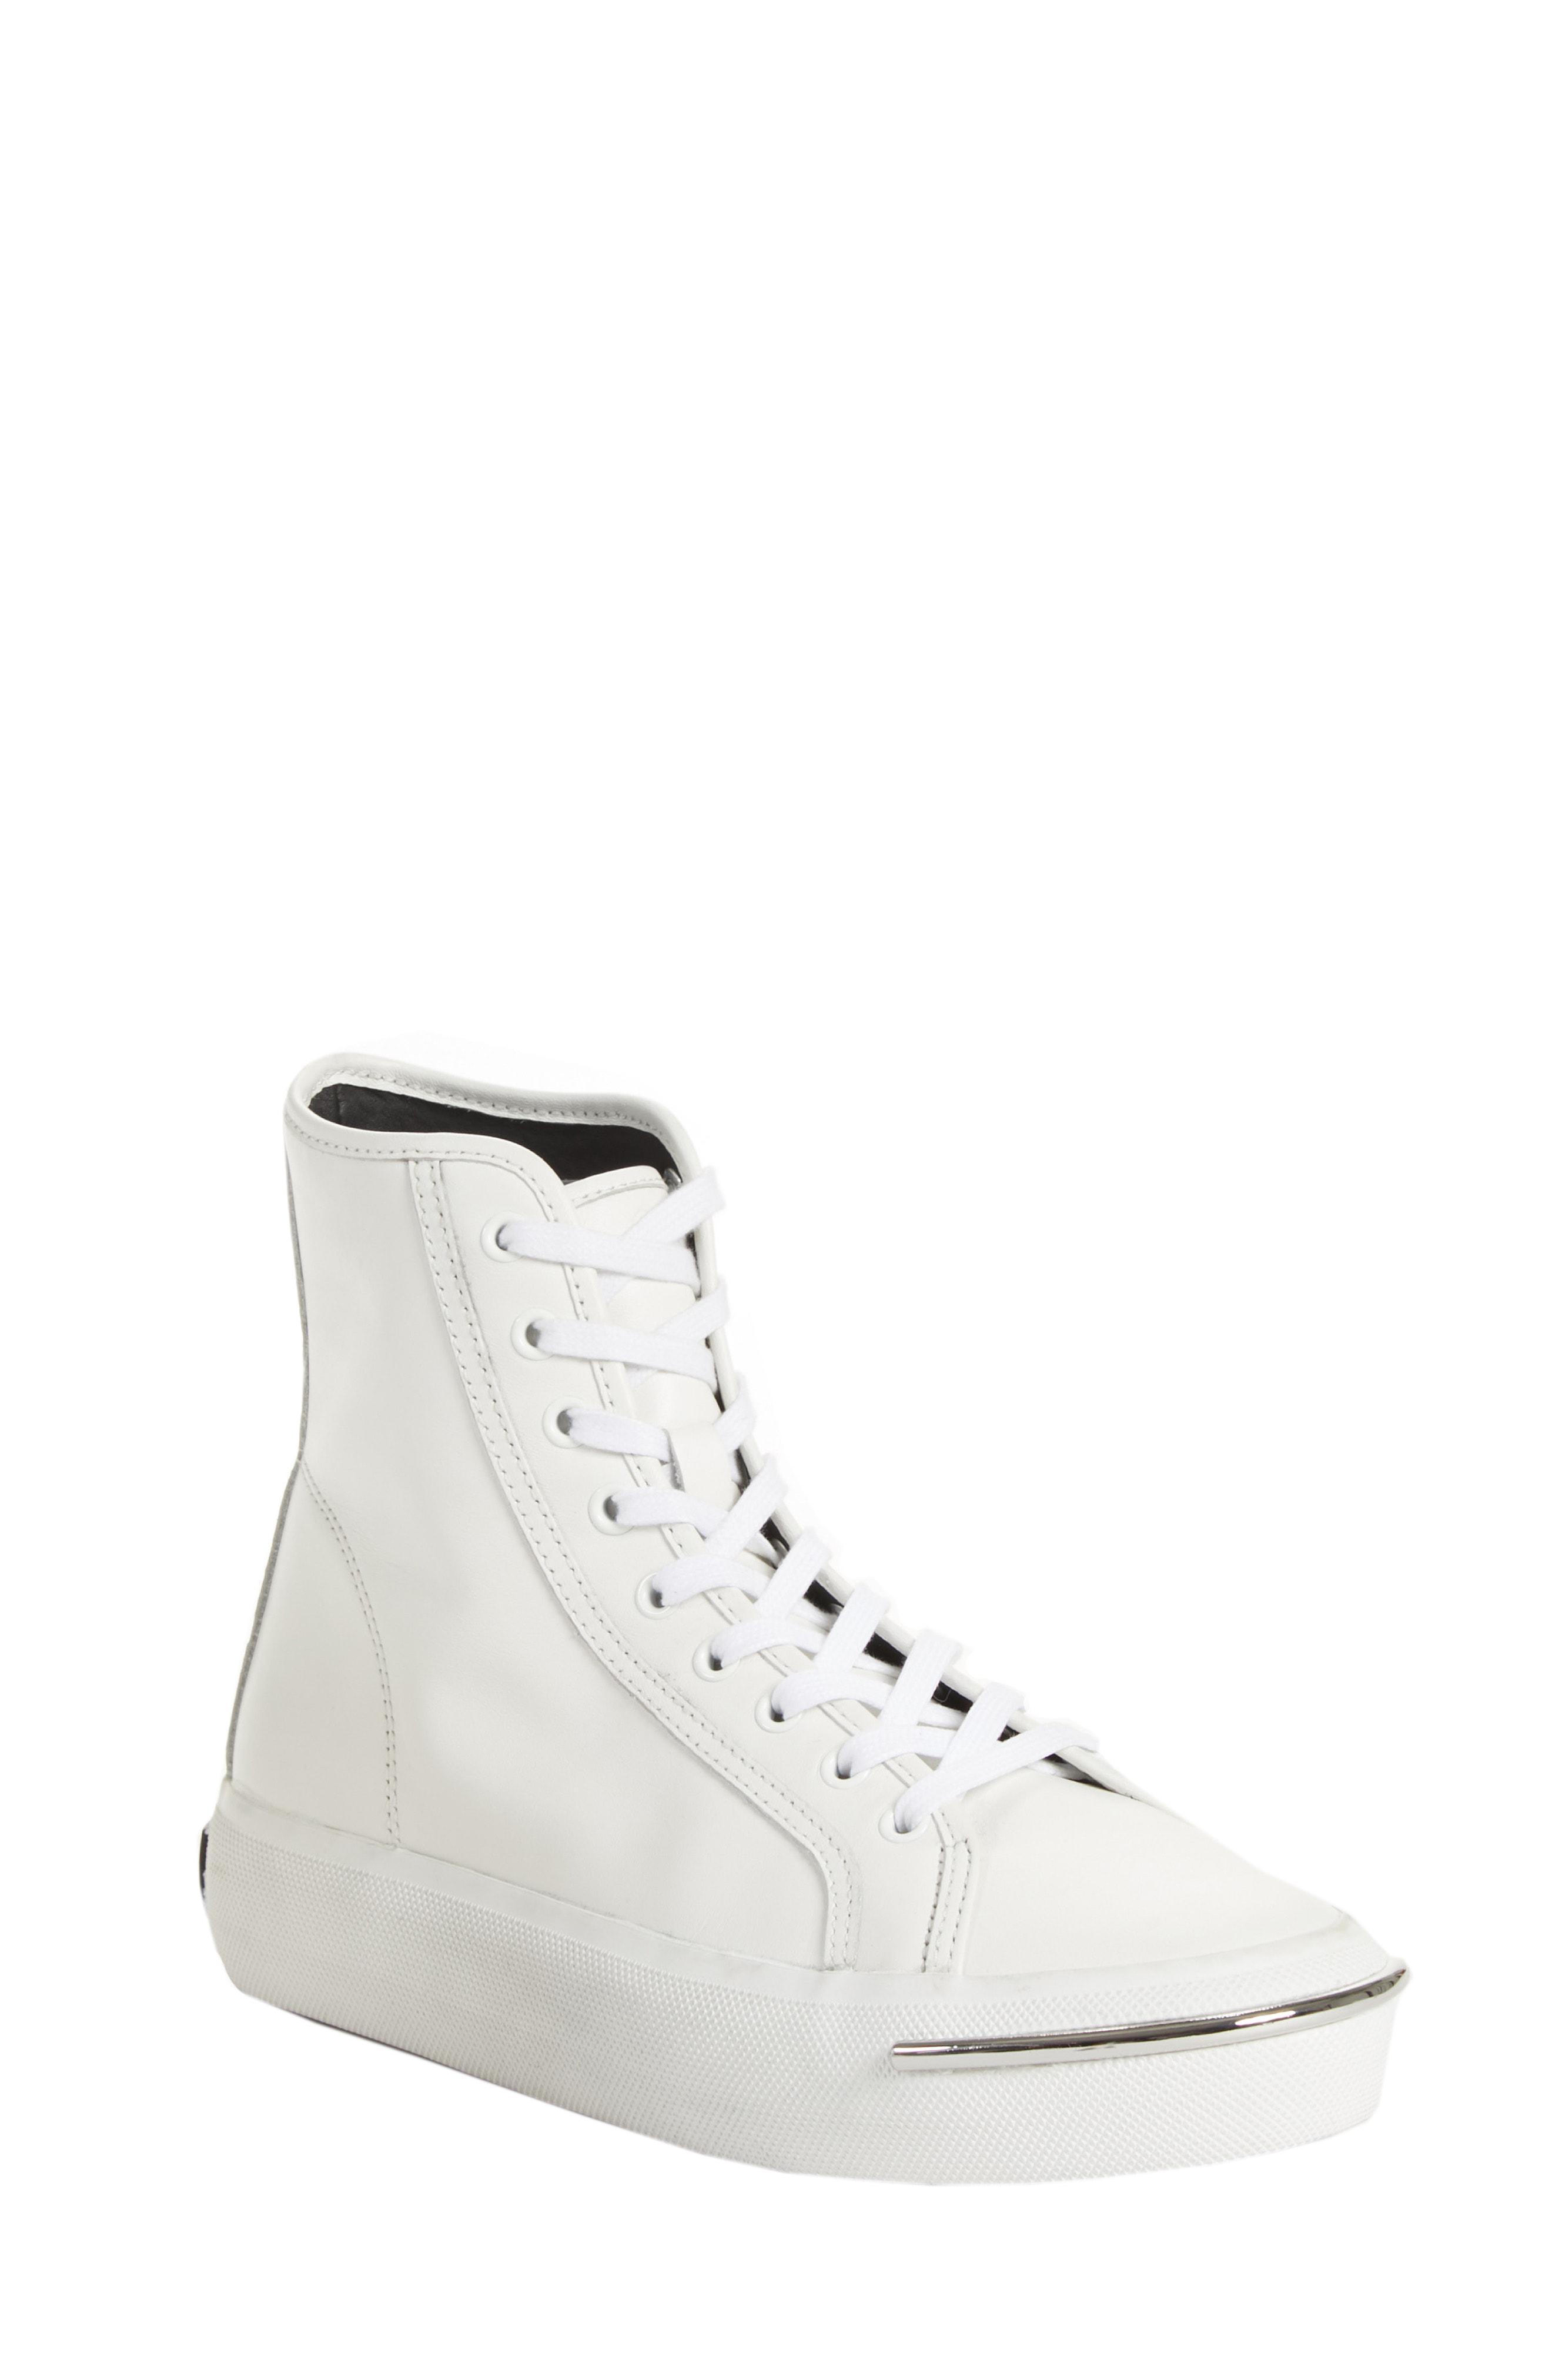 045e137e7763 Lyst - Alexander Wang Pia High Top Sneaker in White